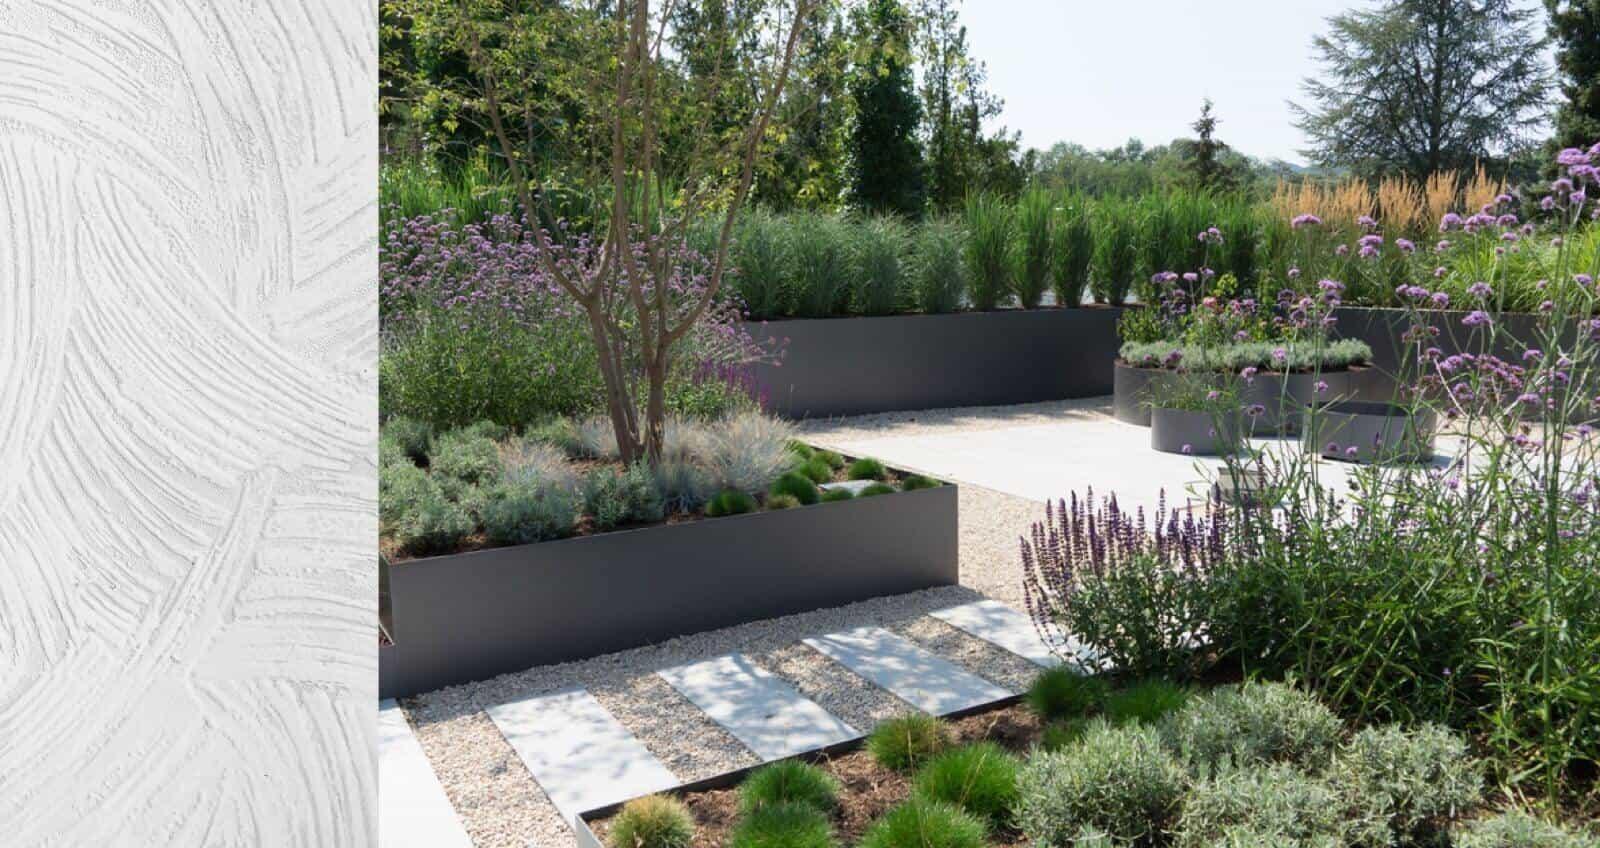 a landscape design featuring a wide assortment of plants